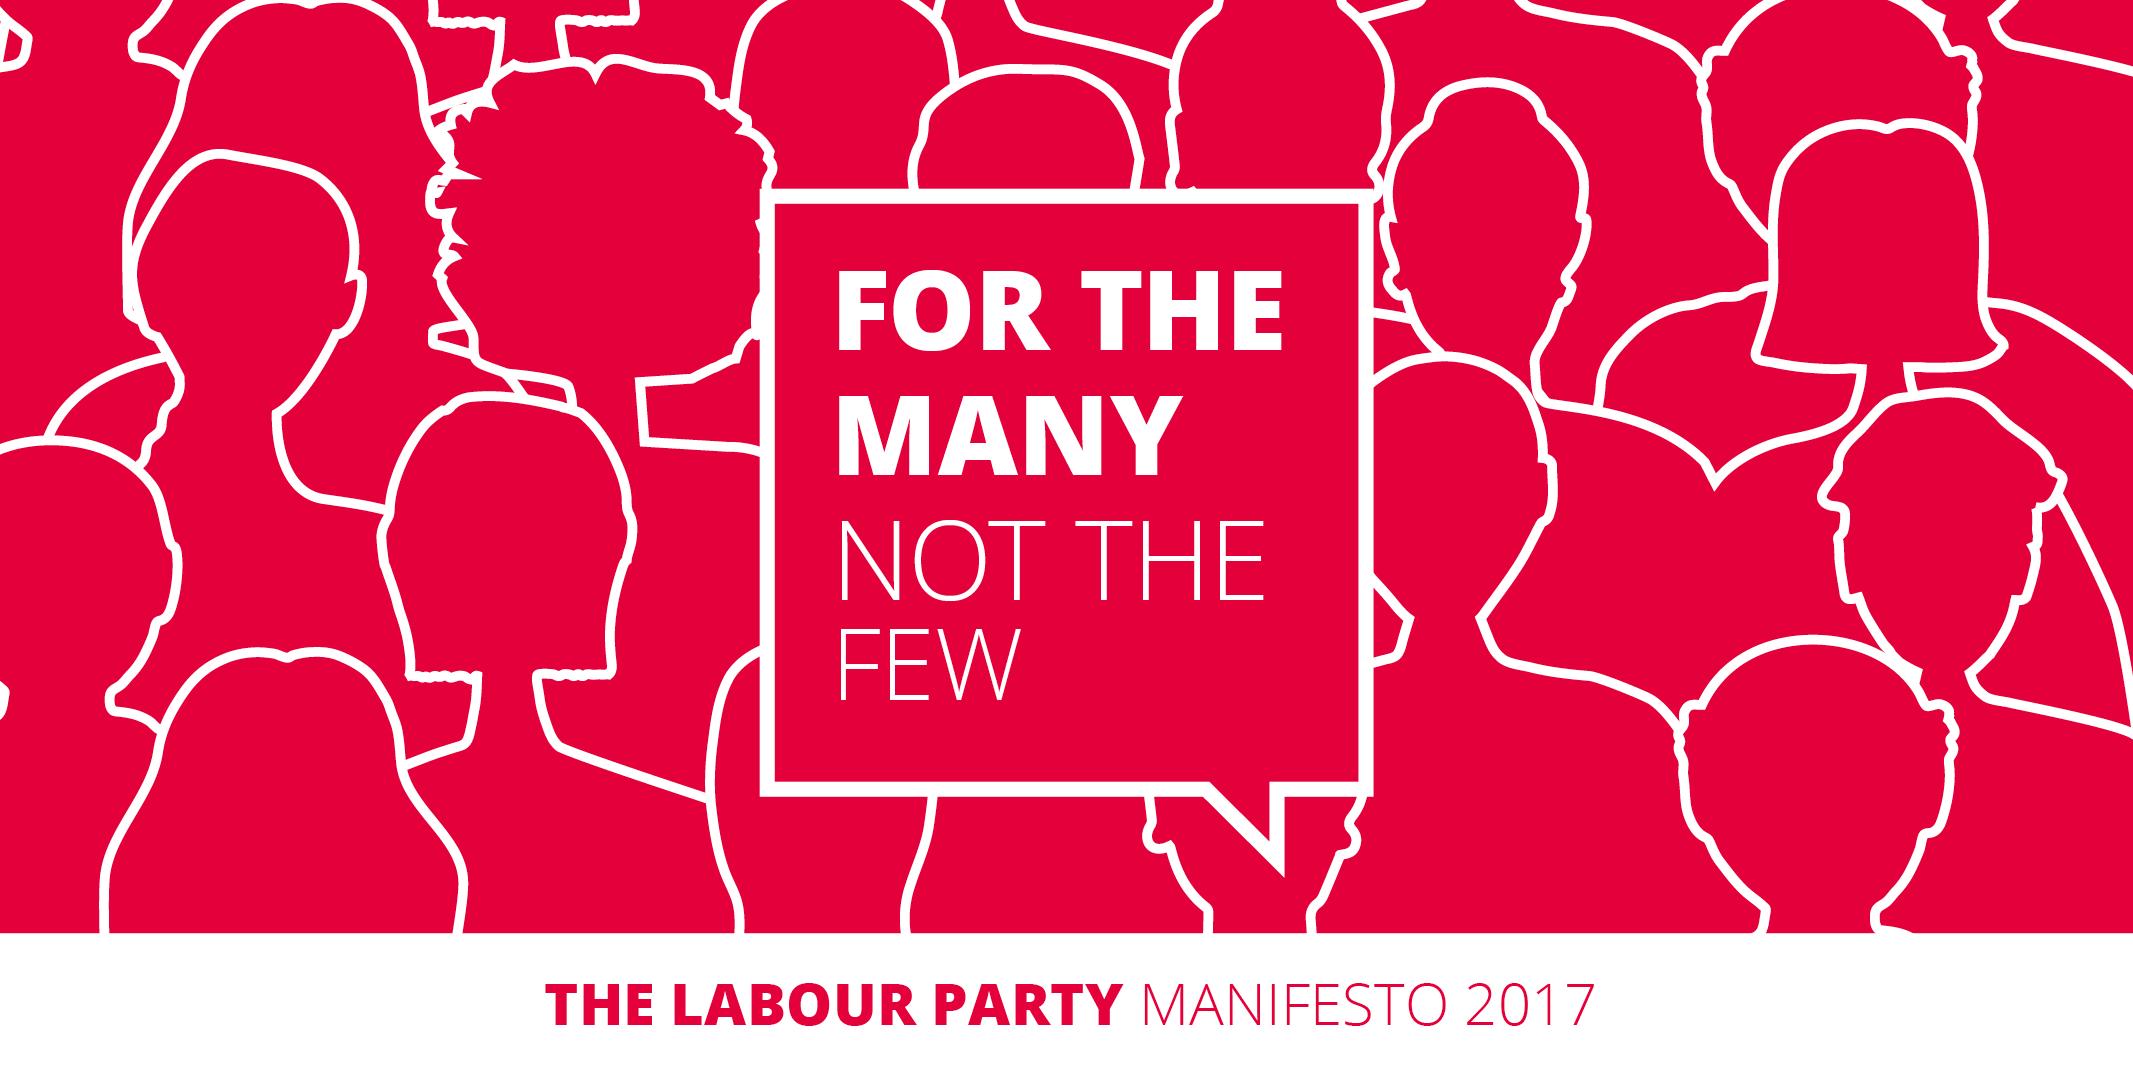 Manifesto_MAIN.png